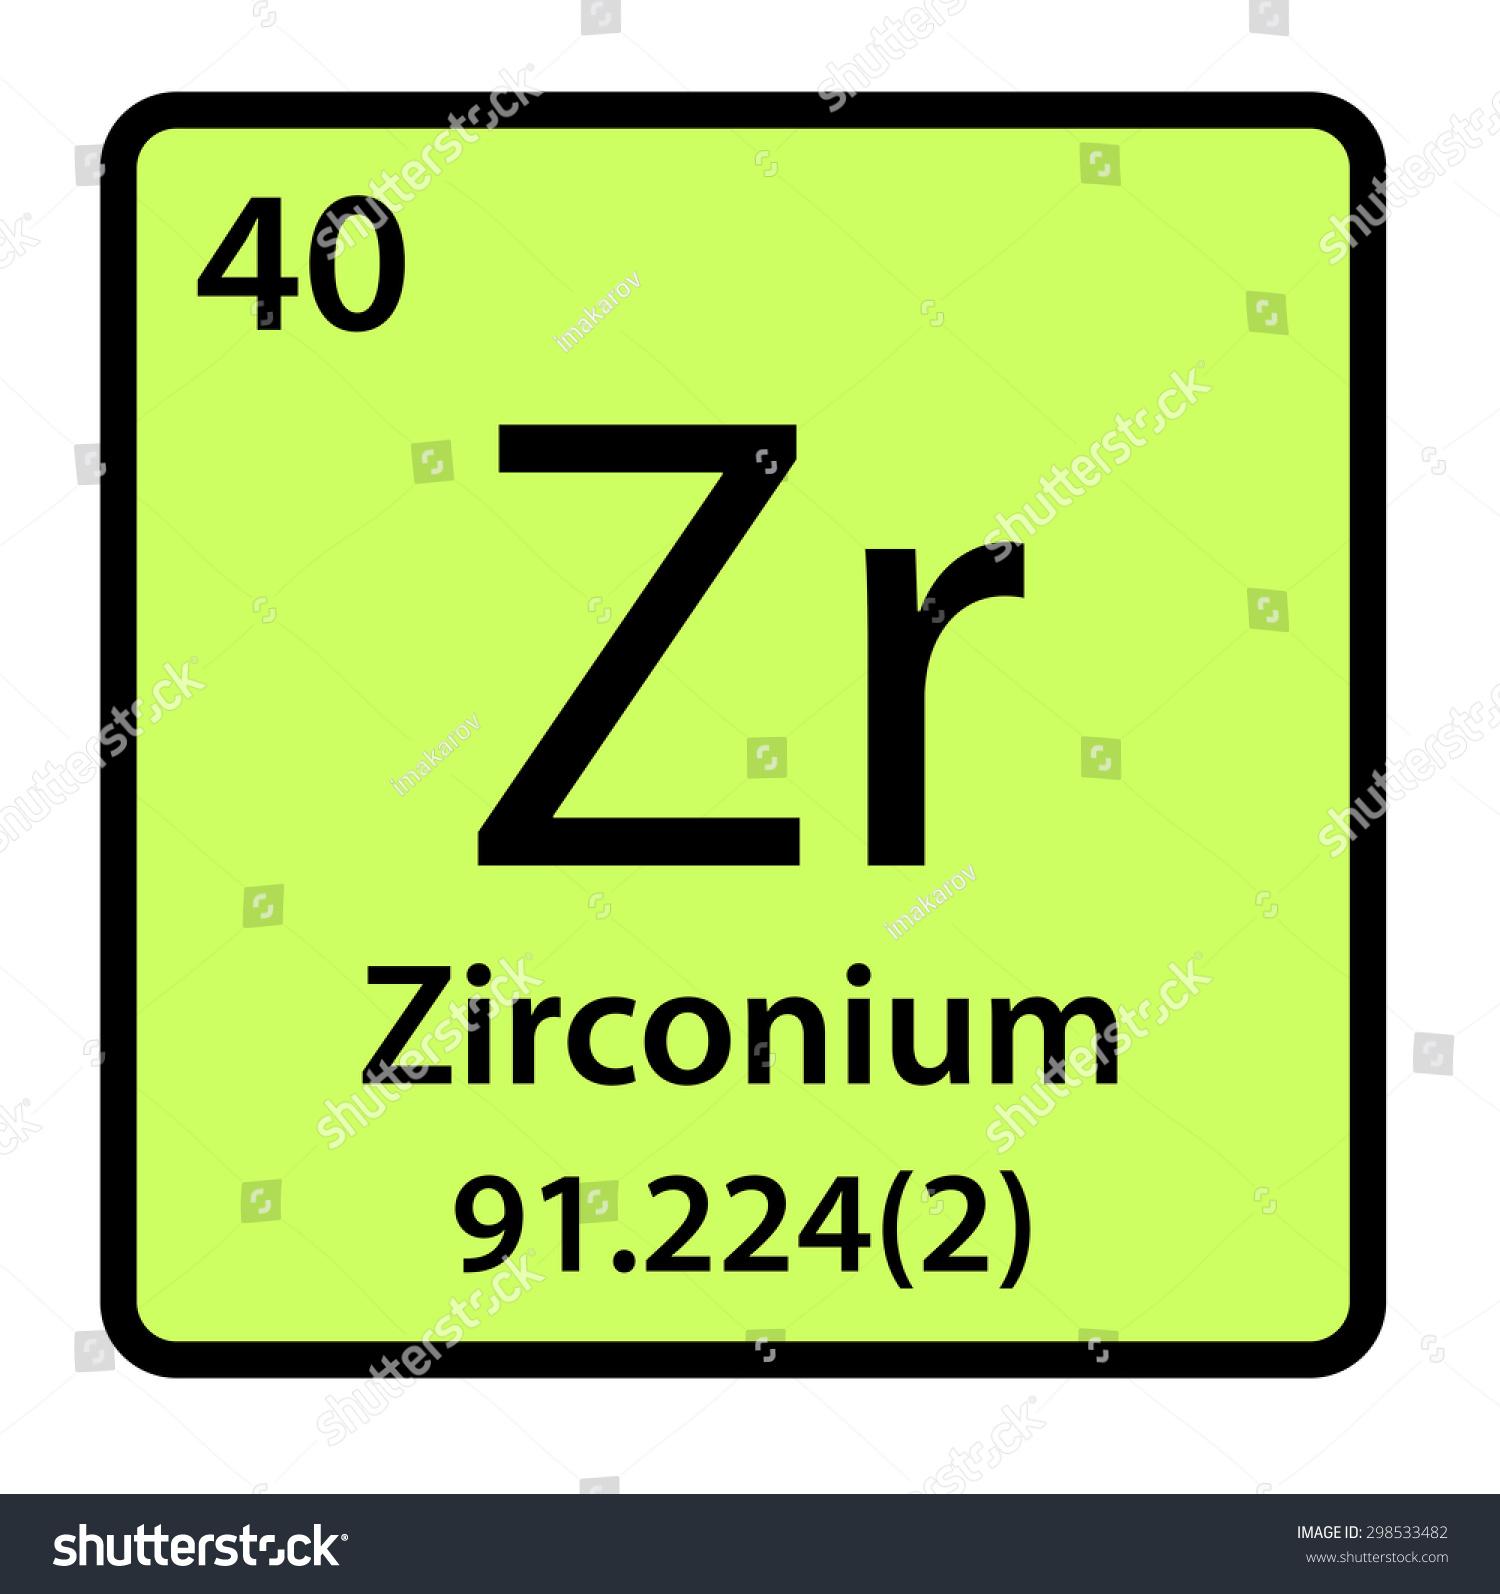 Element zirconium periodic table stock illustration 298533482 element zirconium of the periodic table gamestrikefo Images